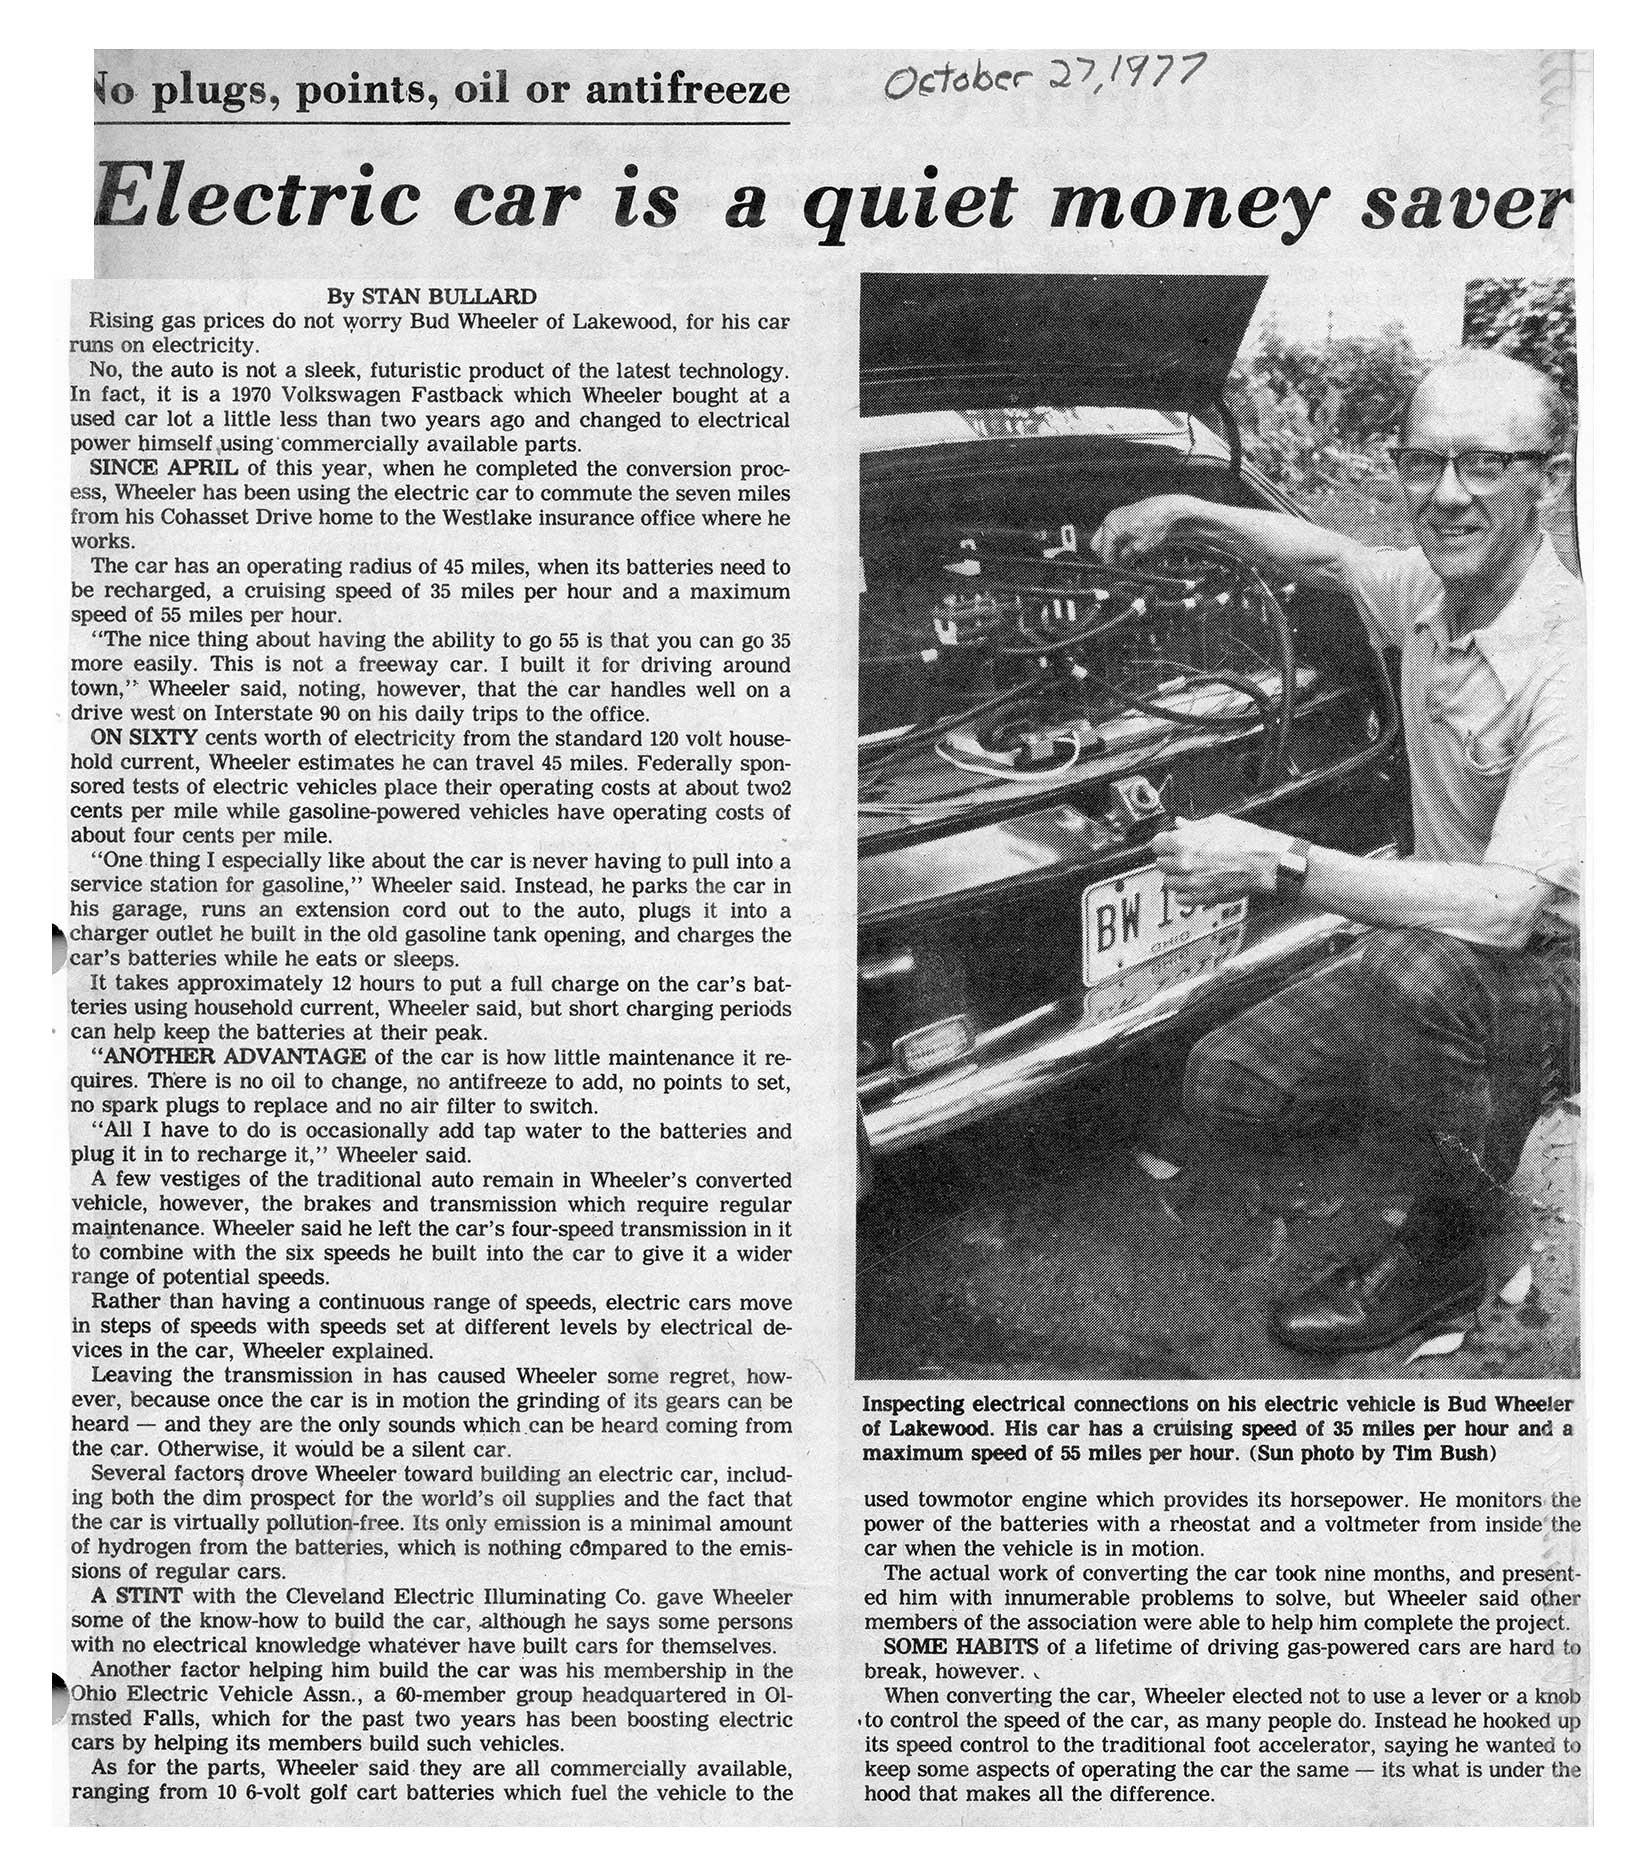 Bud Wheeler Electric Car Newspaper Article